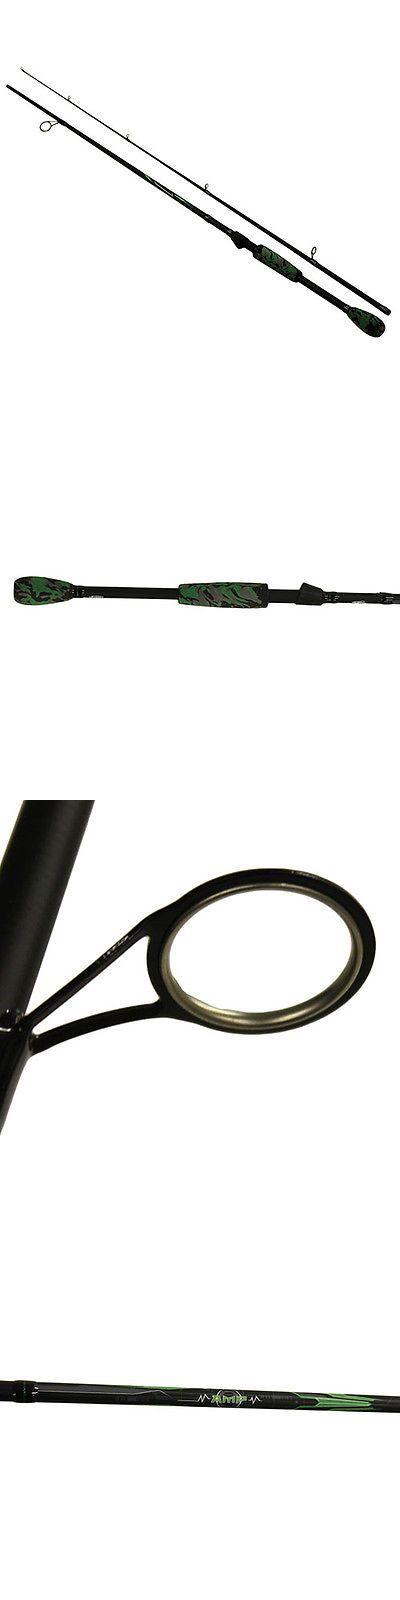 Spinning Rods 36150: Berkley 1363587 Amp Spinning Rod Bsamp702m-Mf Amp M 7 2Pc -> BUY IT NOW ONLY: $31.04 on eBay!